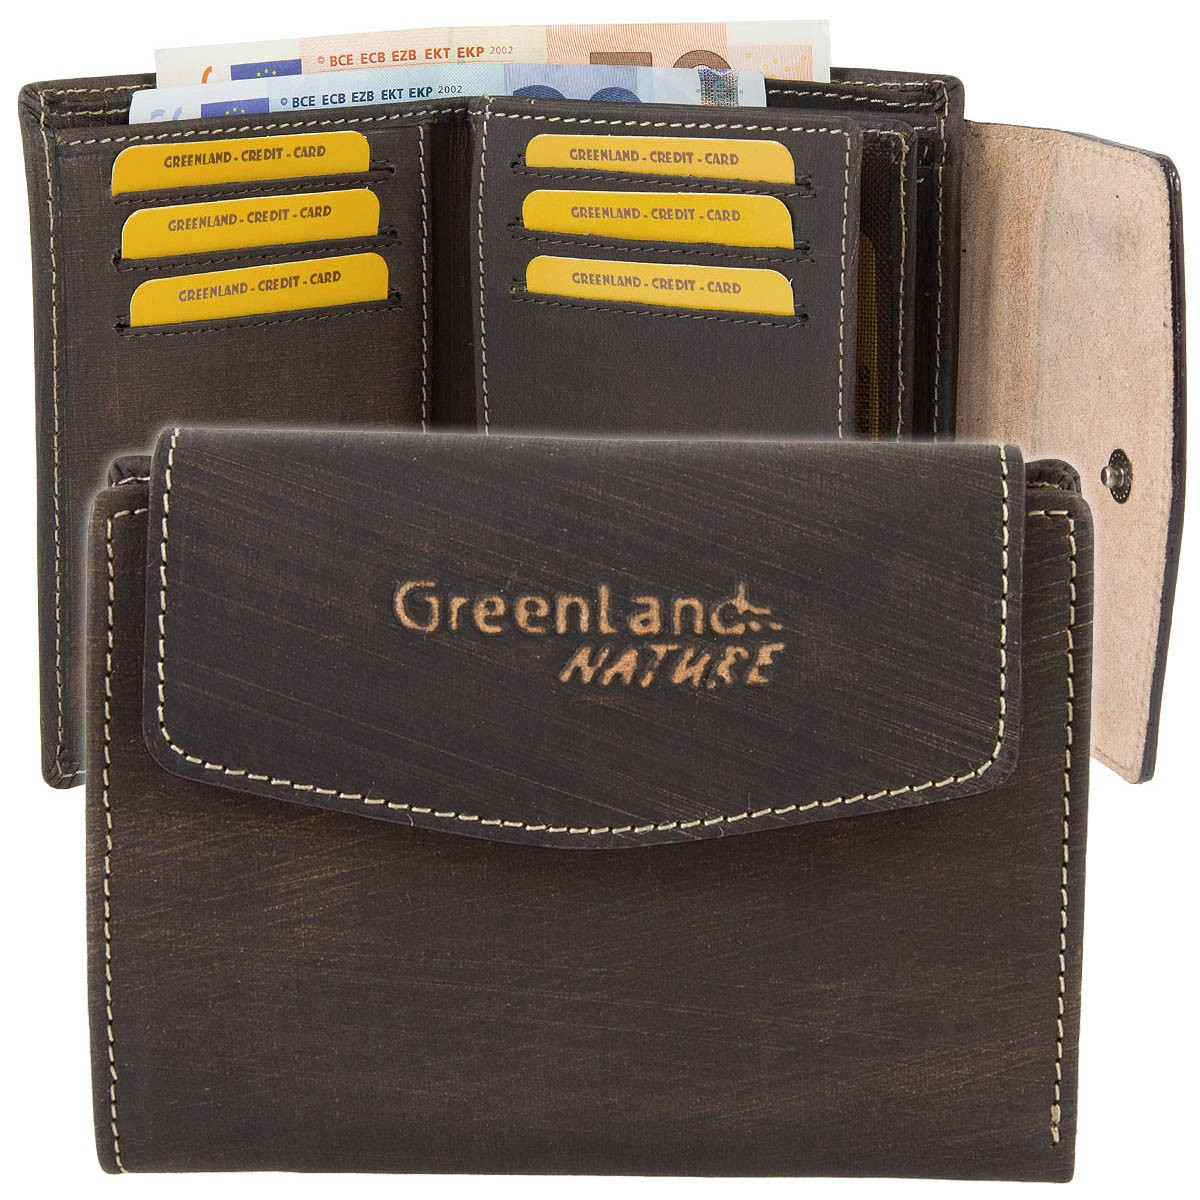 GREENLAND Nature Handbrush Leder Geldbörse Portemonnaie 1566-25